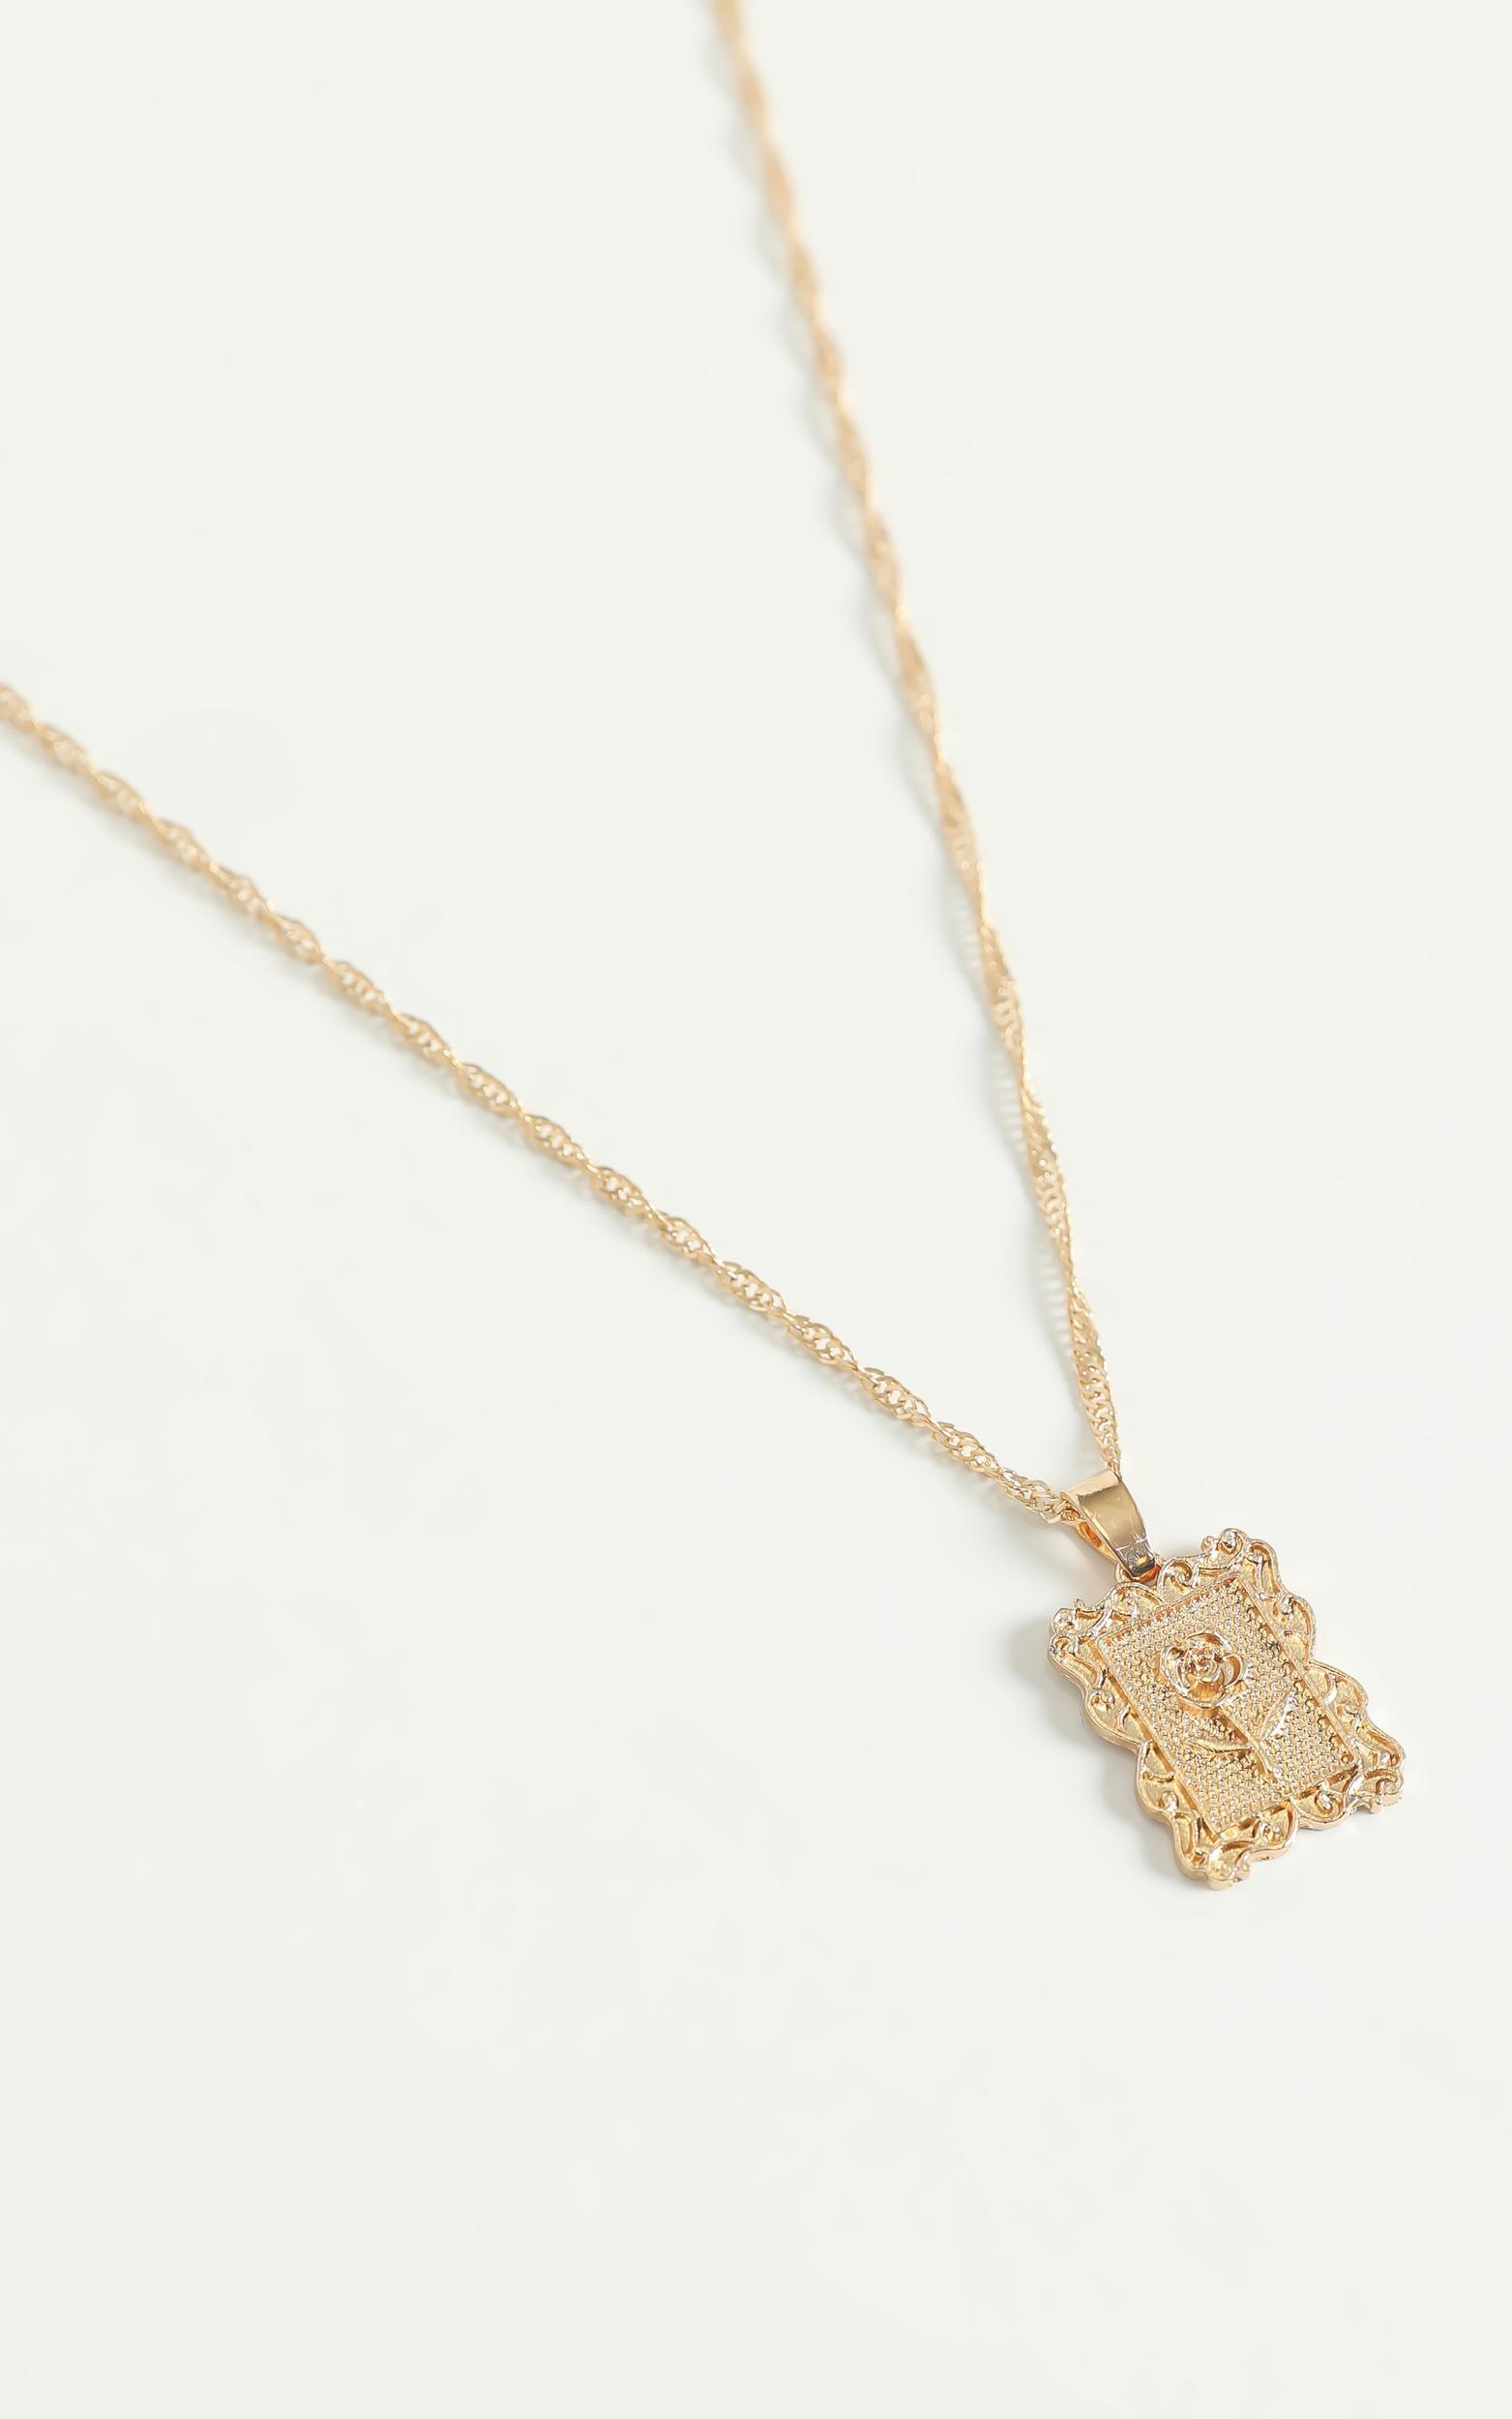 Portrait Rose Necklace in Gold, , hi-res image number null